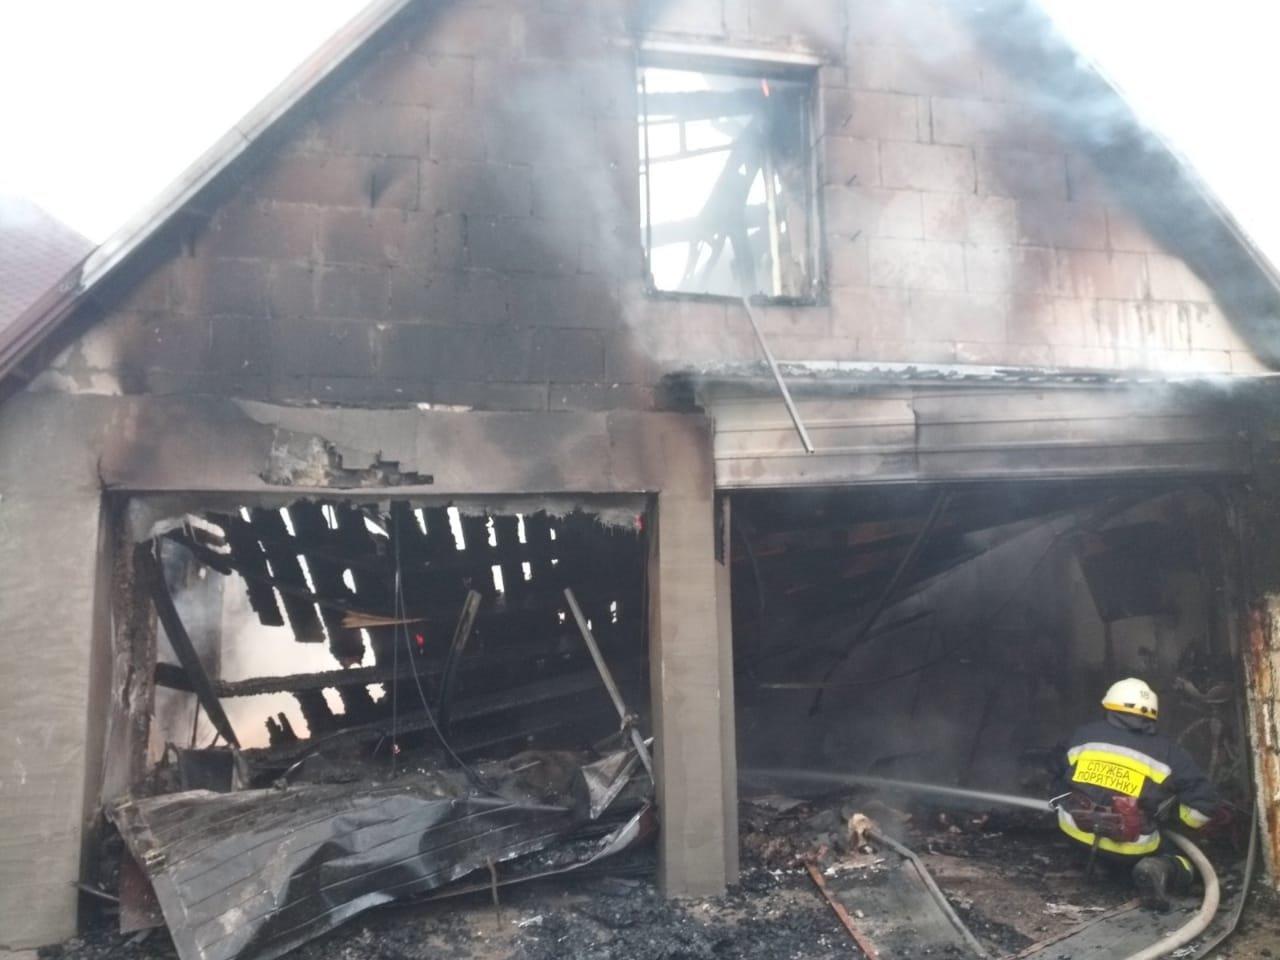 На Днепропетровщине произошел пожар на территории садового общества, - ФОТО, фото-2